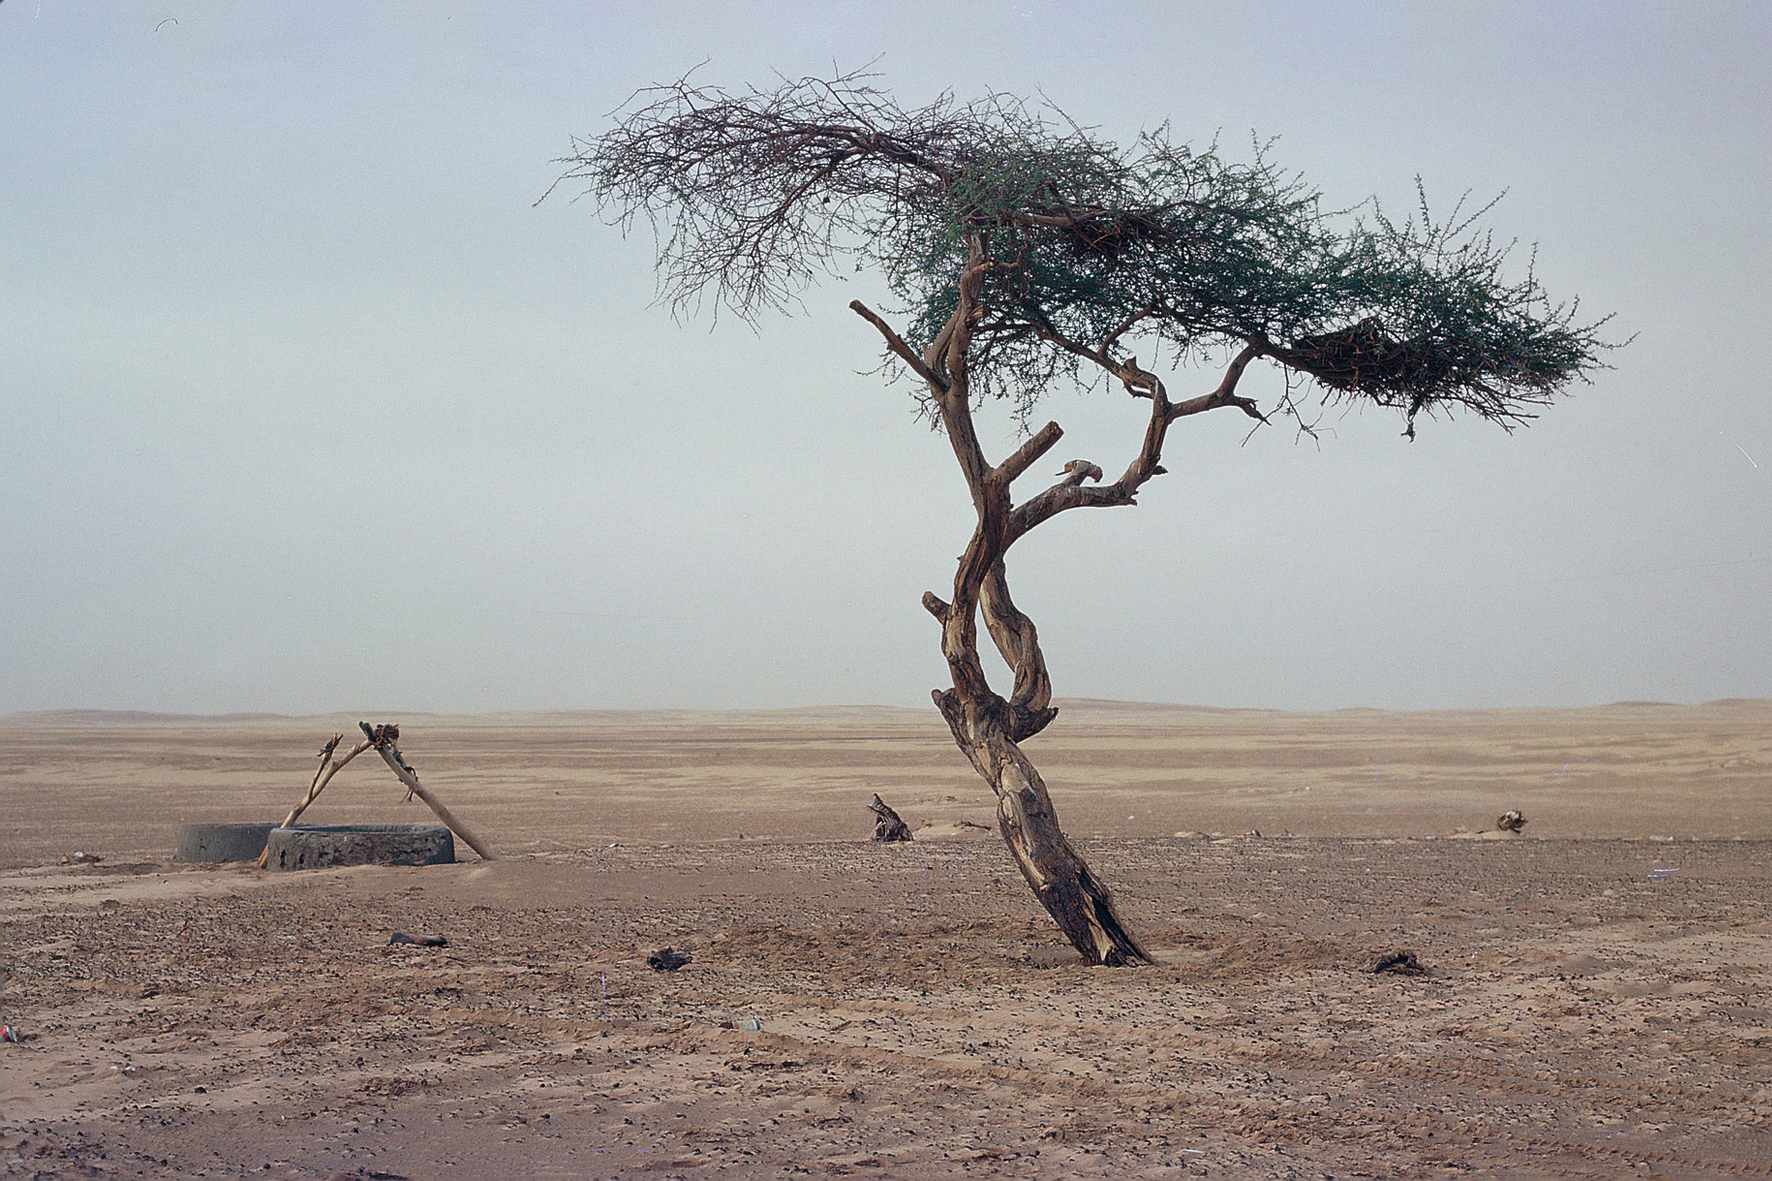 THE WORLD'S LONELIEST TREE